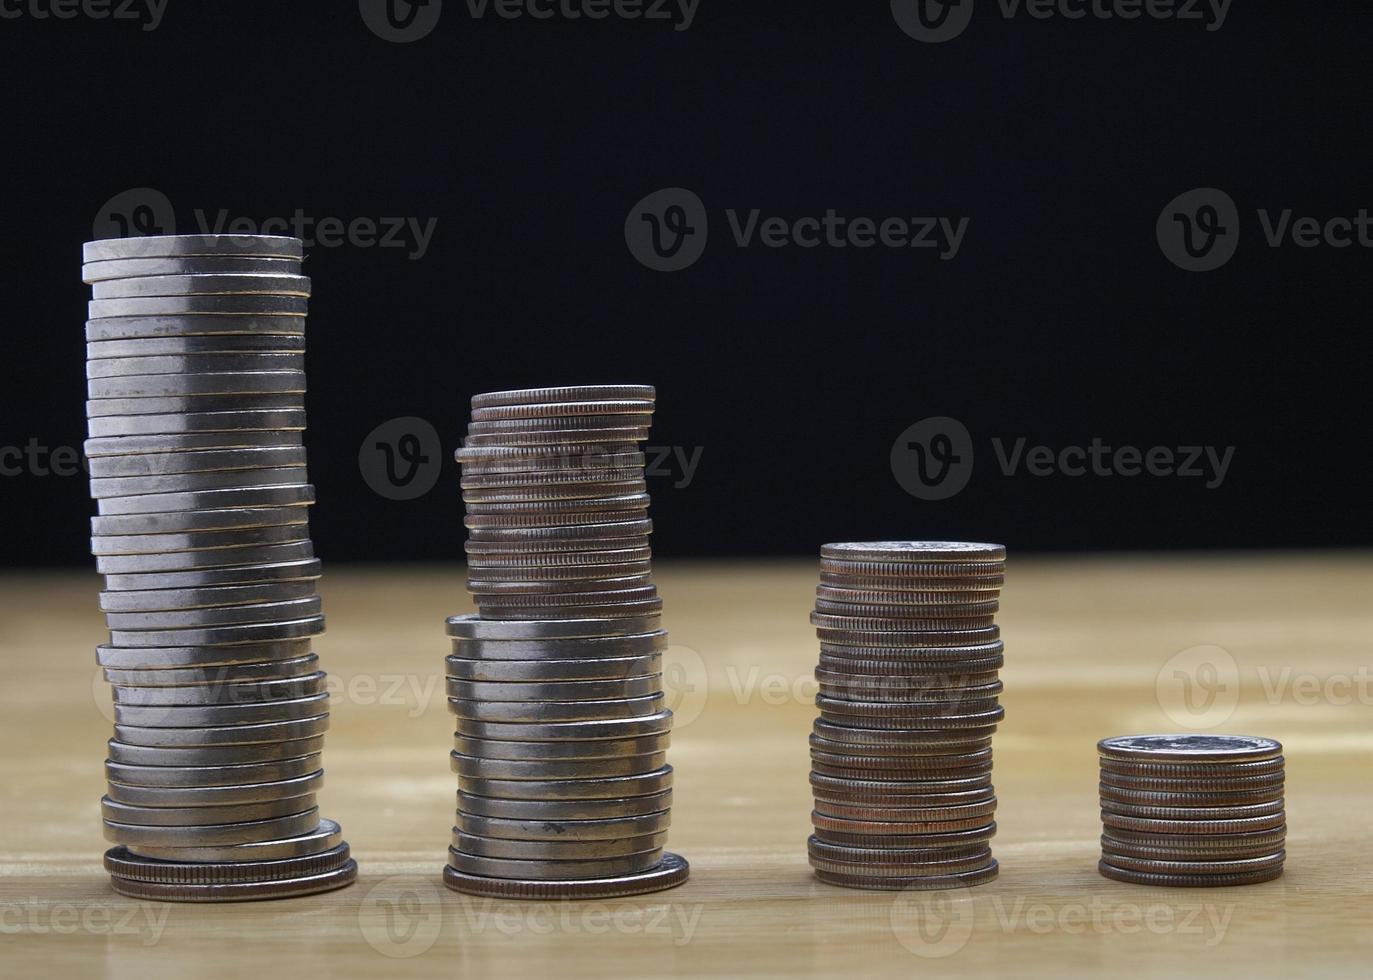 torres de monedas foto